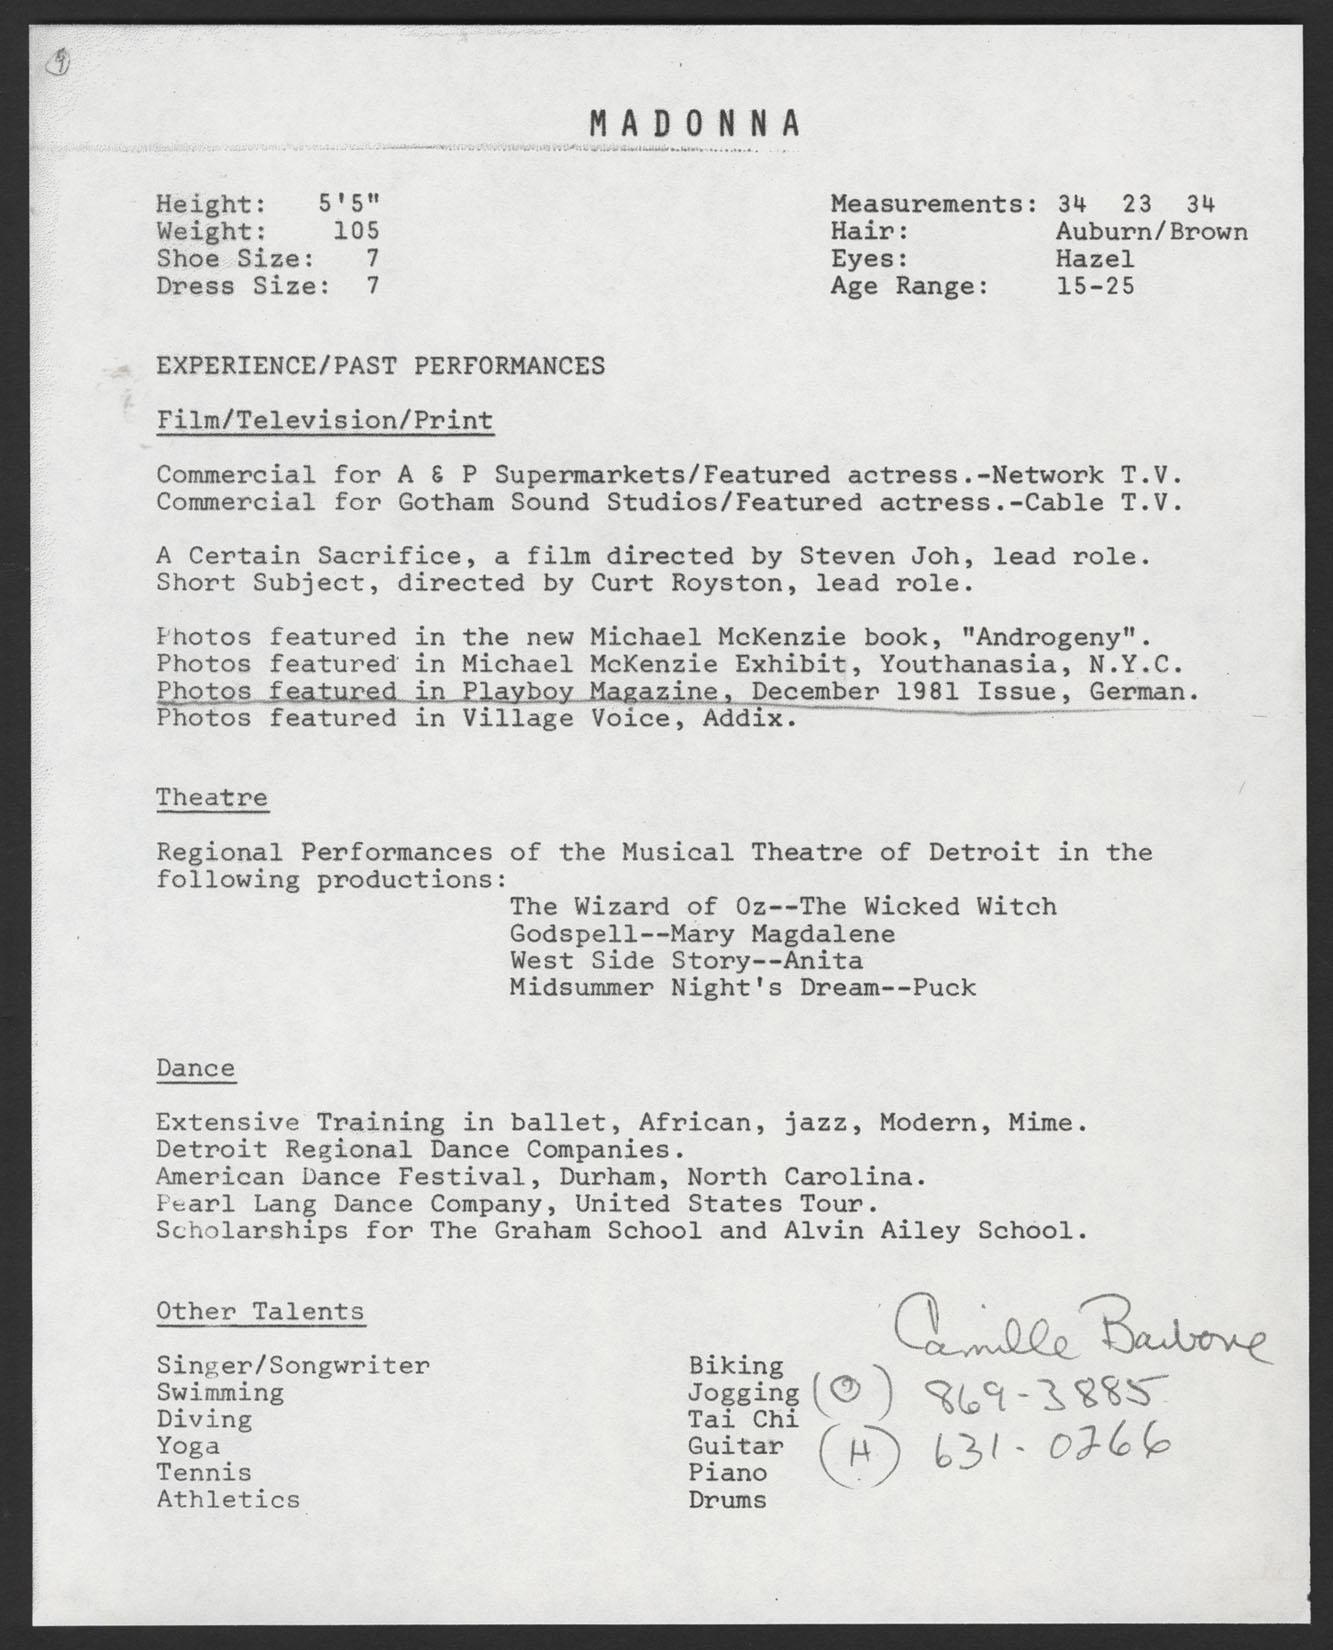 Lot Detail - Madonna Original Resume and Photograph